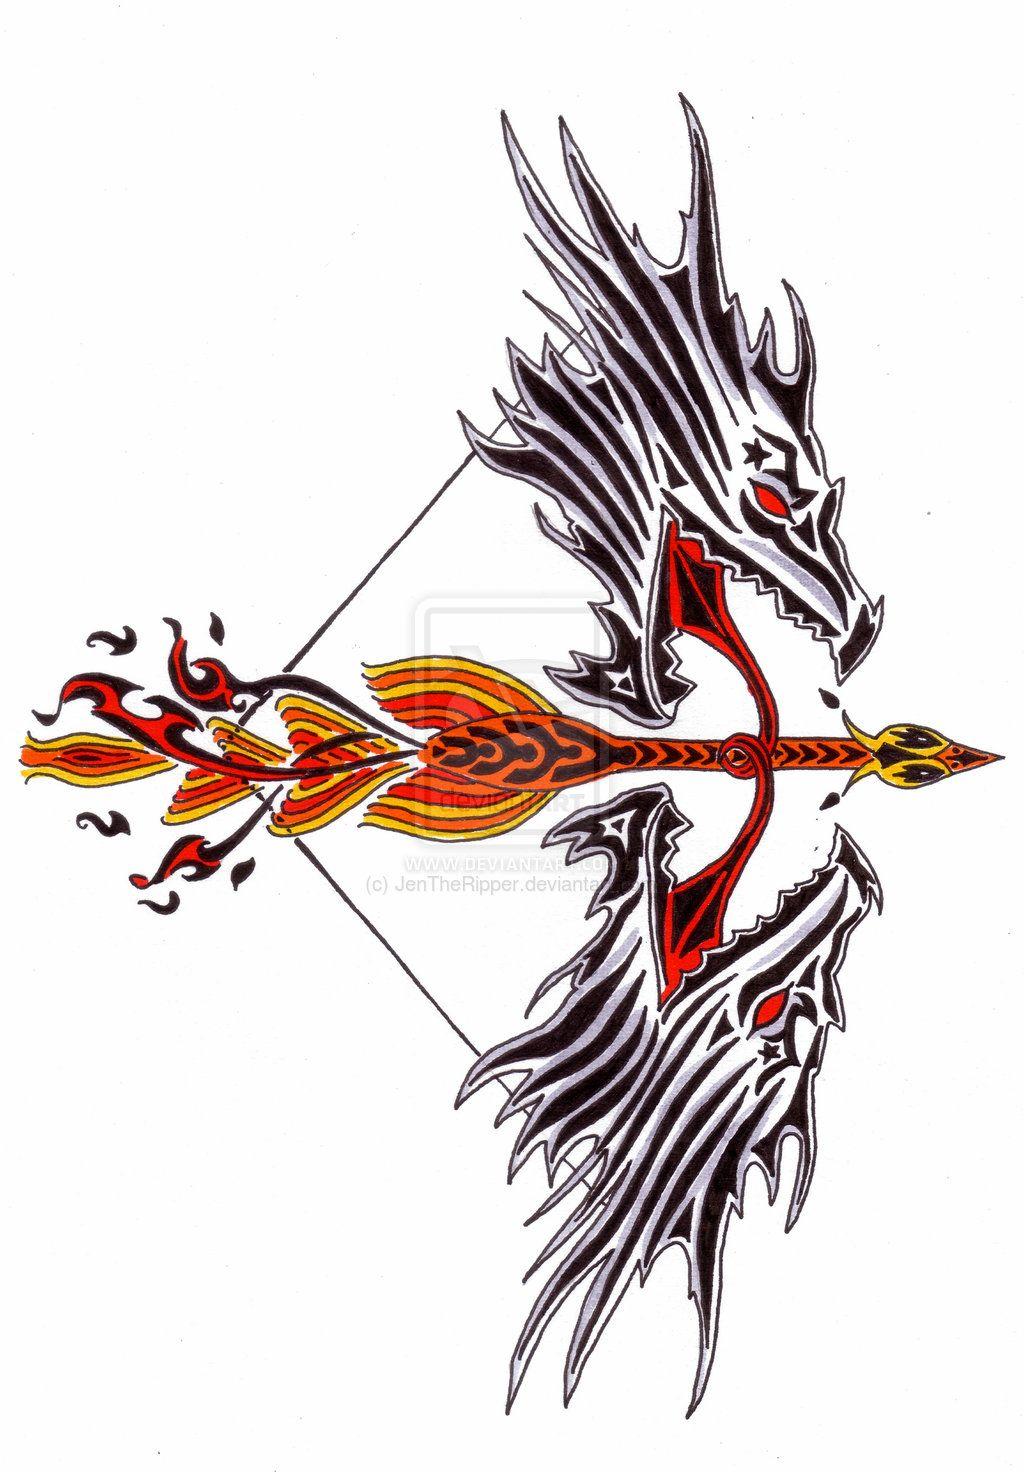 Tribal Bow And Arrow By Jentheripper Deviantart Com On Deviantart Bow Tattoo Designs Arrow Tattoos Back Tattoo